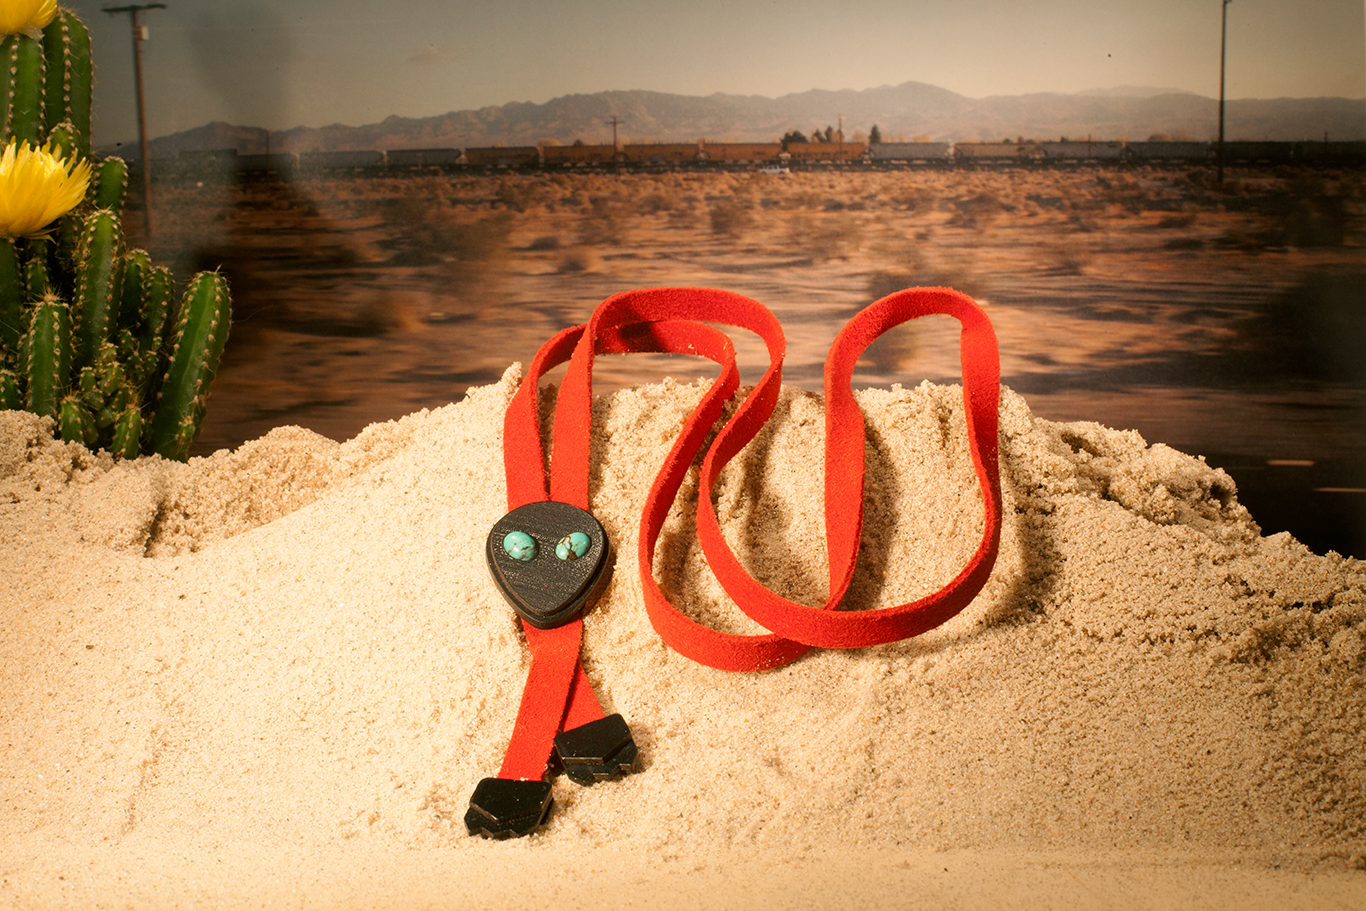 Image of Alien Bolo Tie w/ Turquoise eyes